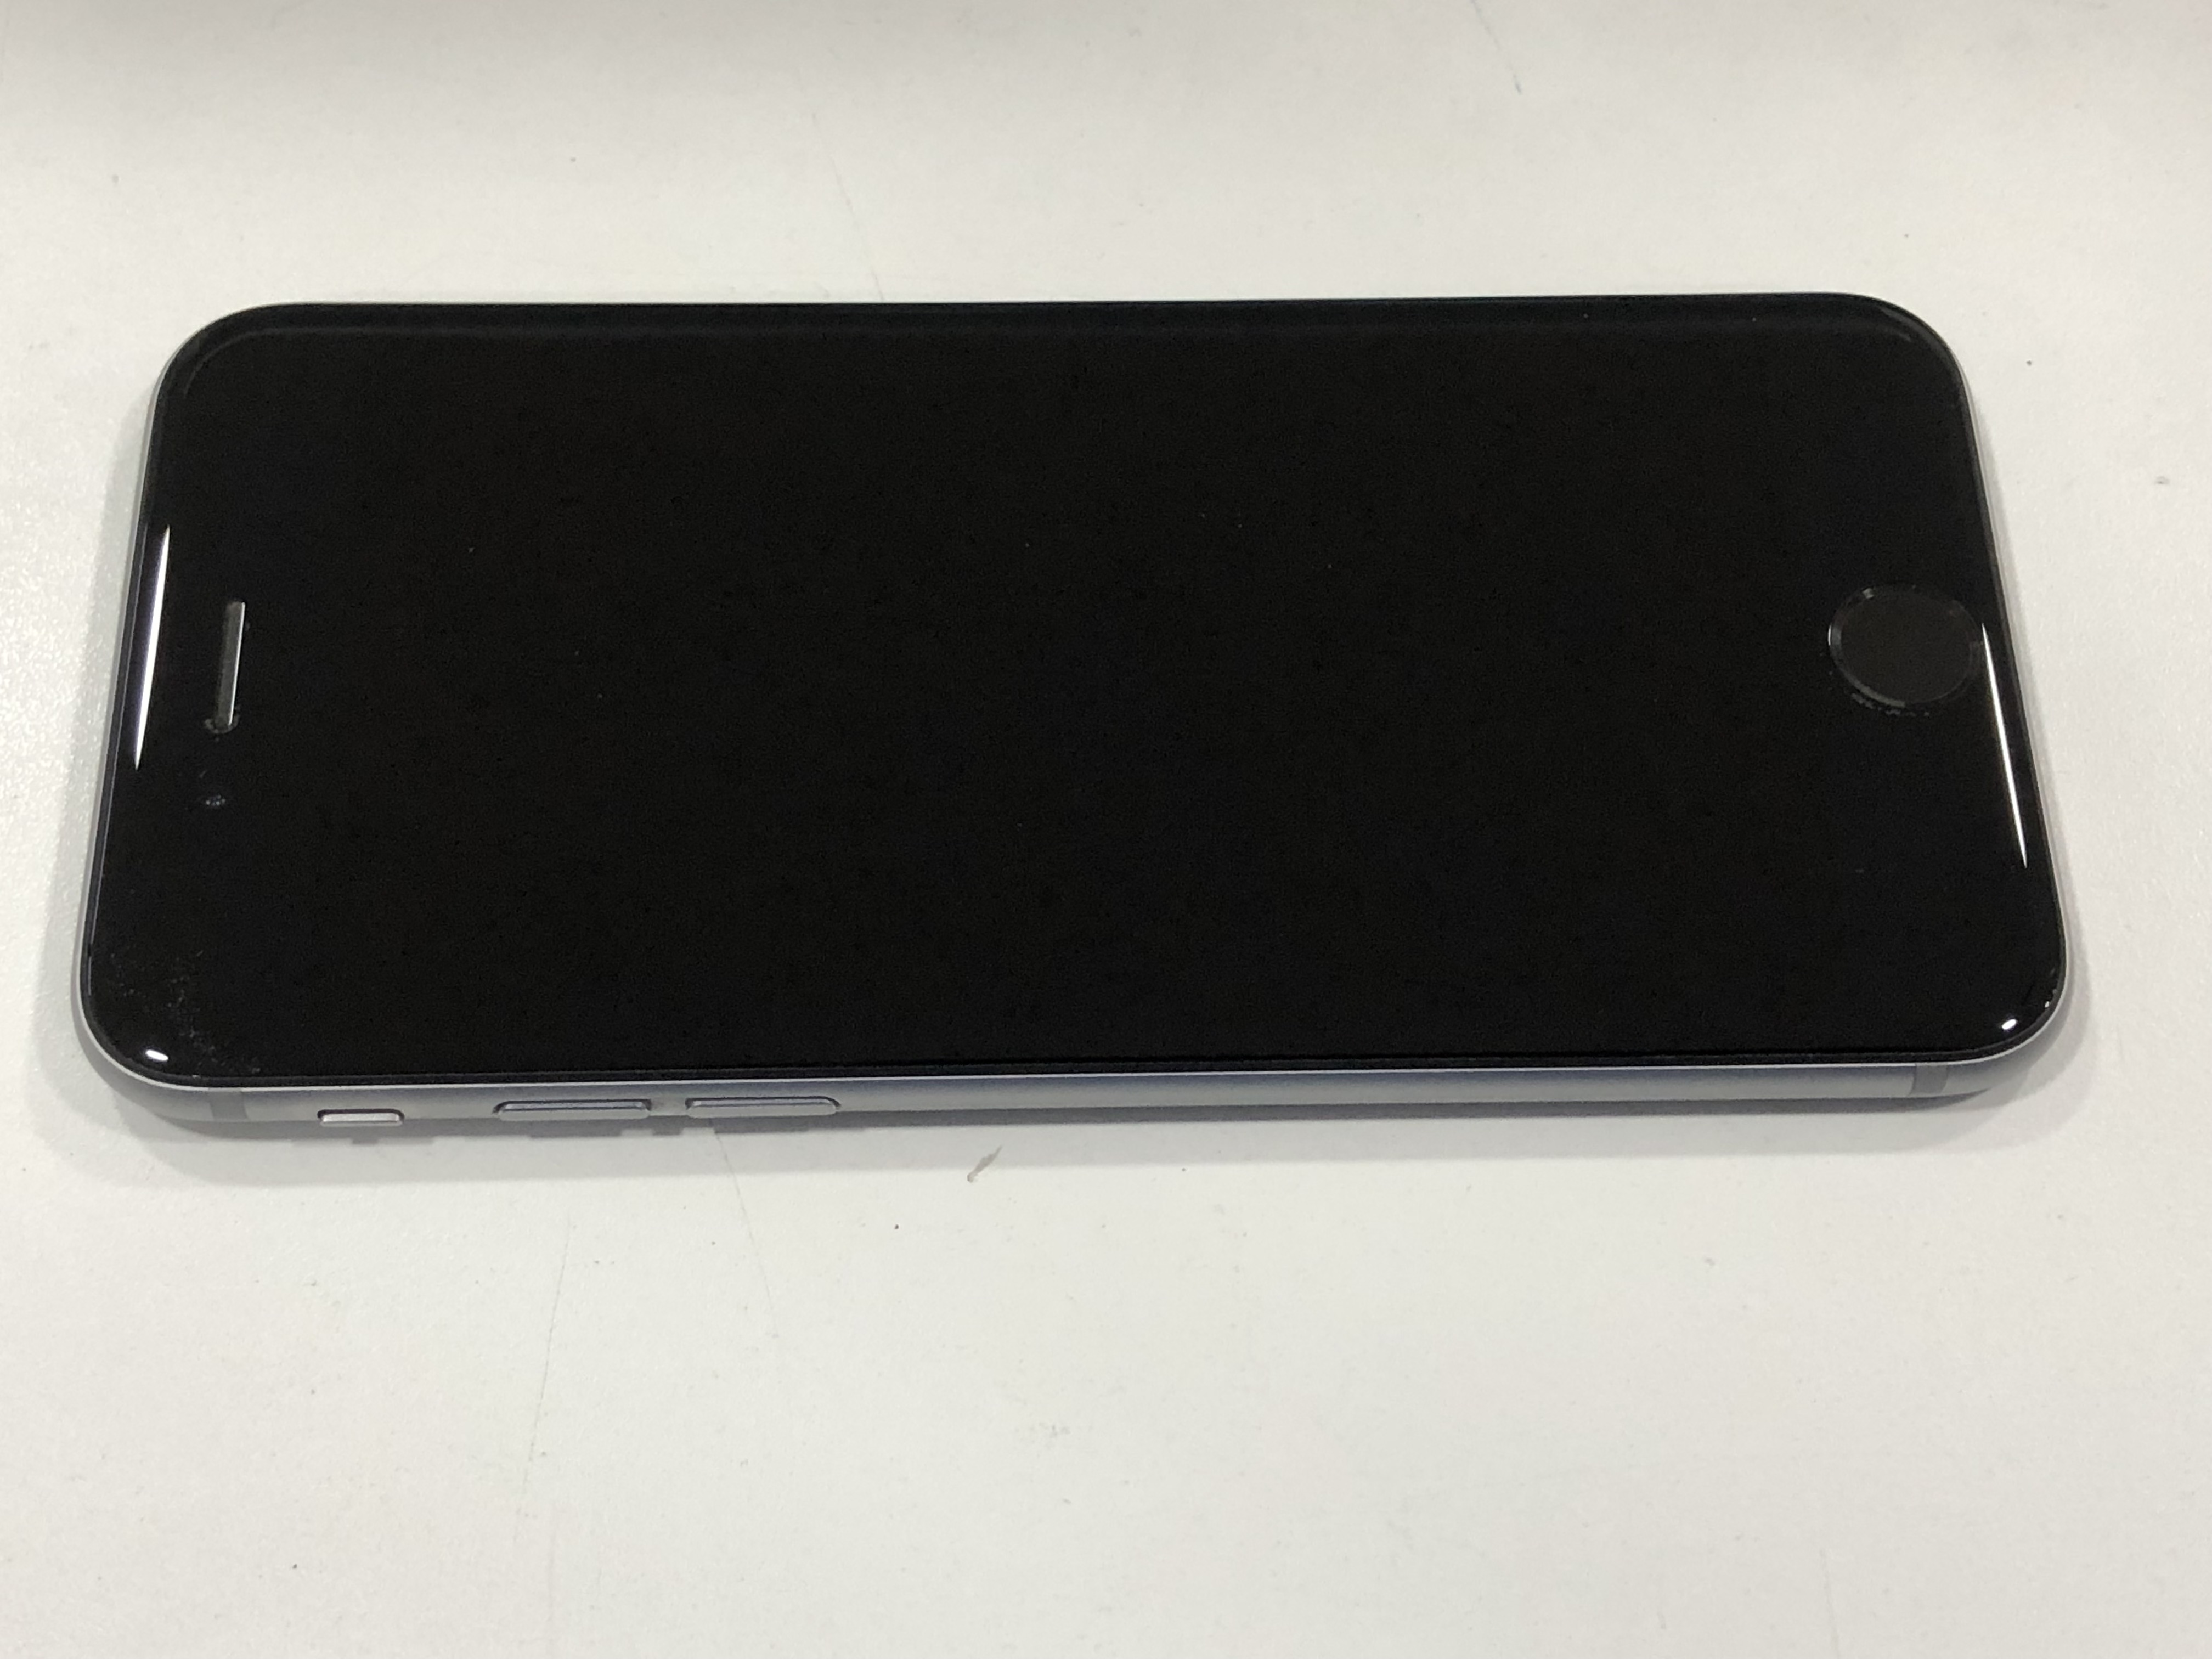 iPhone 6 16GB, 16 GB, Space Gray, imagen 1